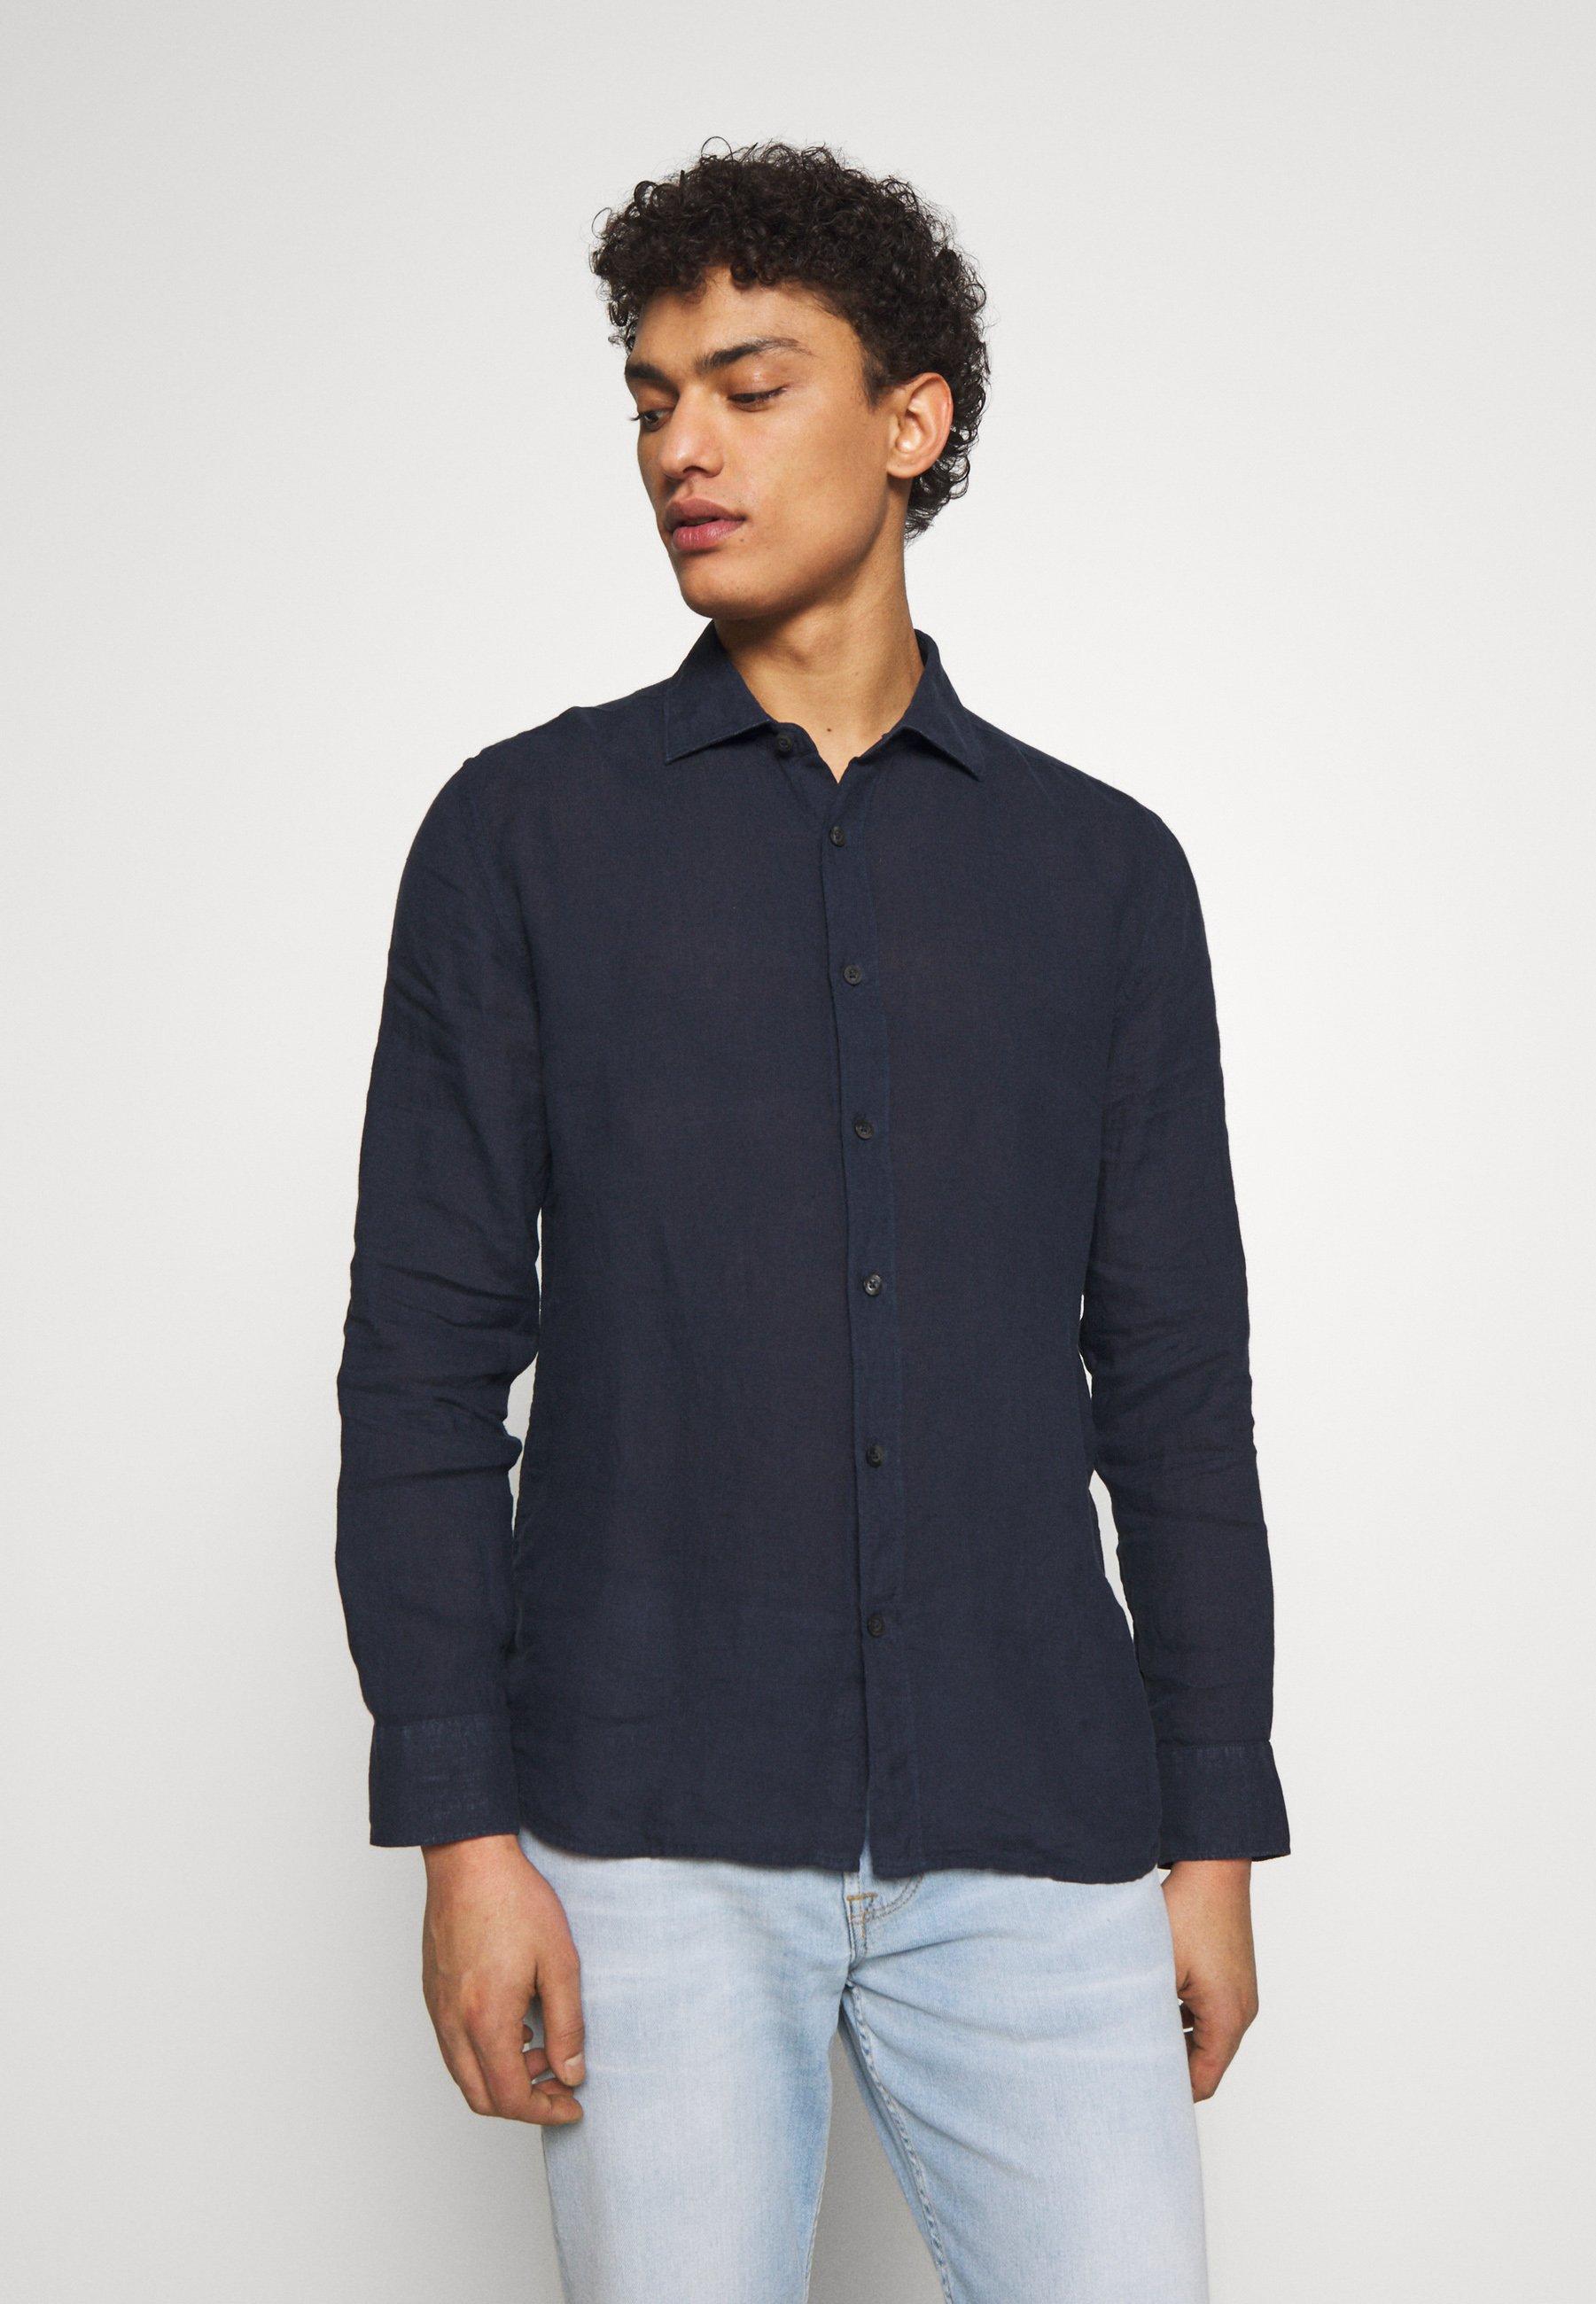 120% Lino Koszula - blue navy